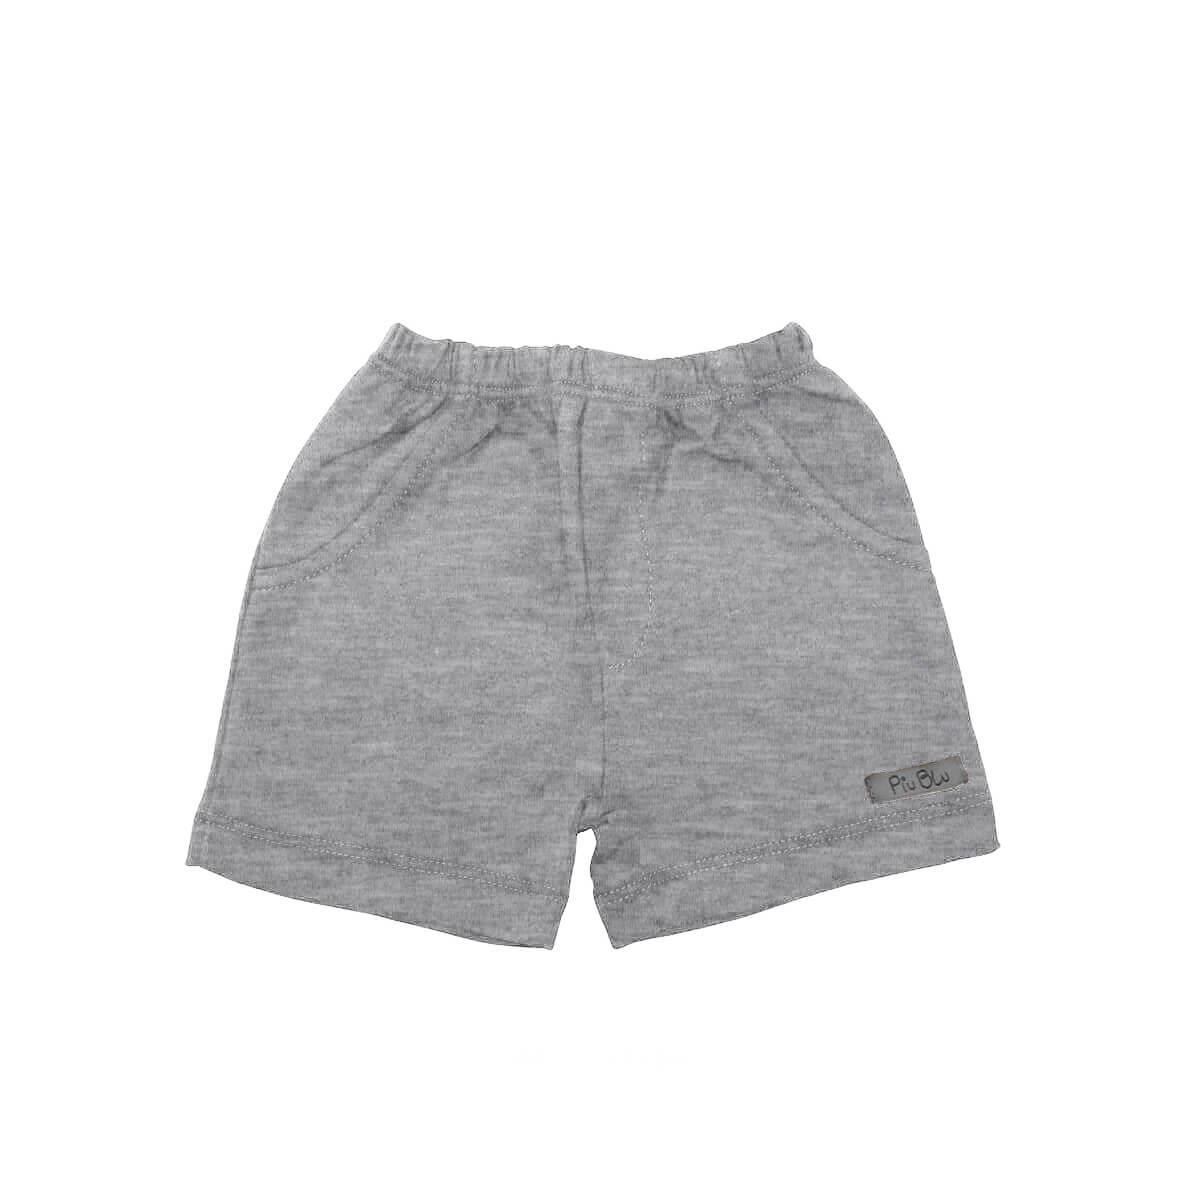 Shorts Masculino 1 ao 4 Mescla